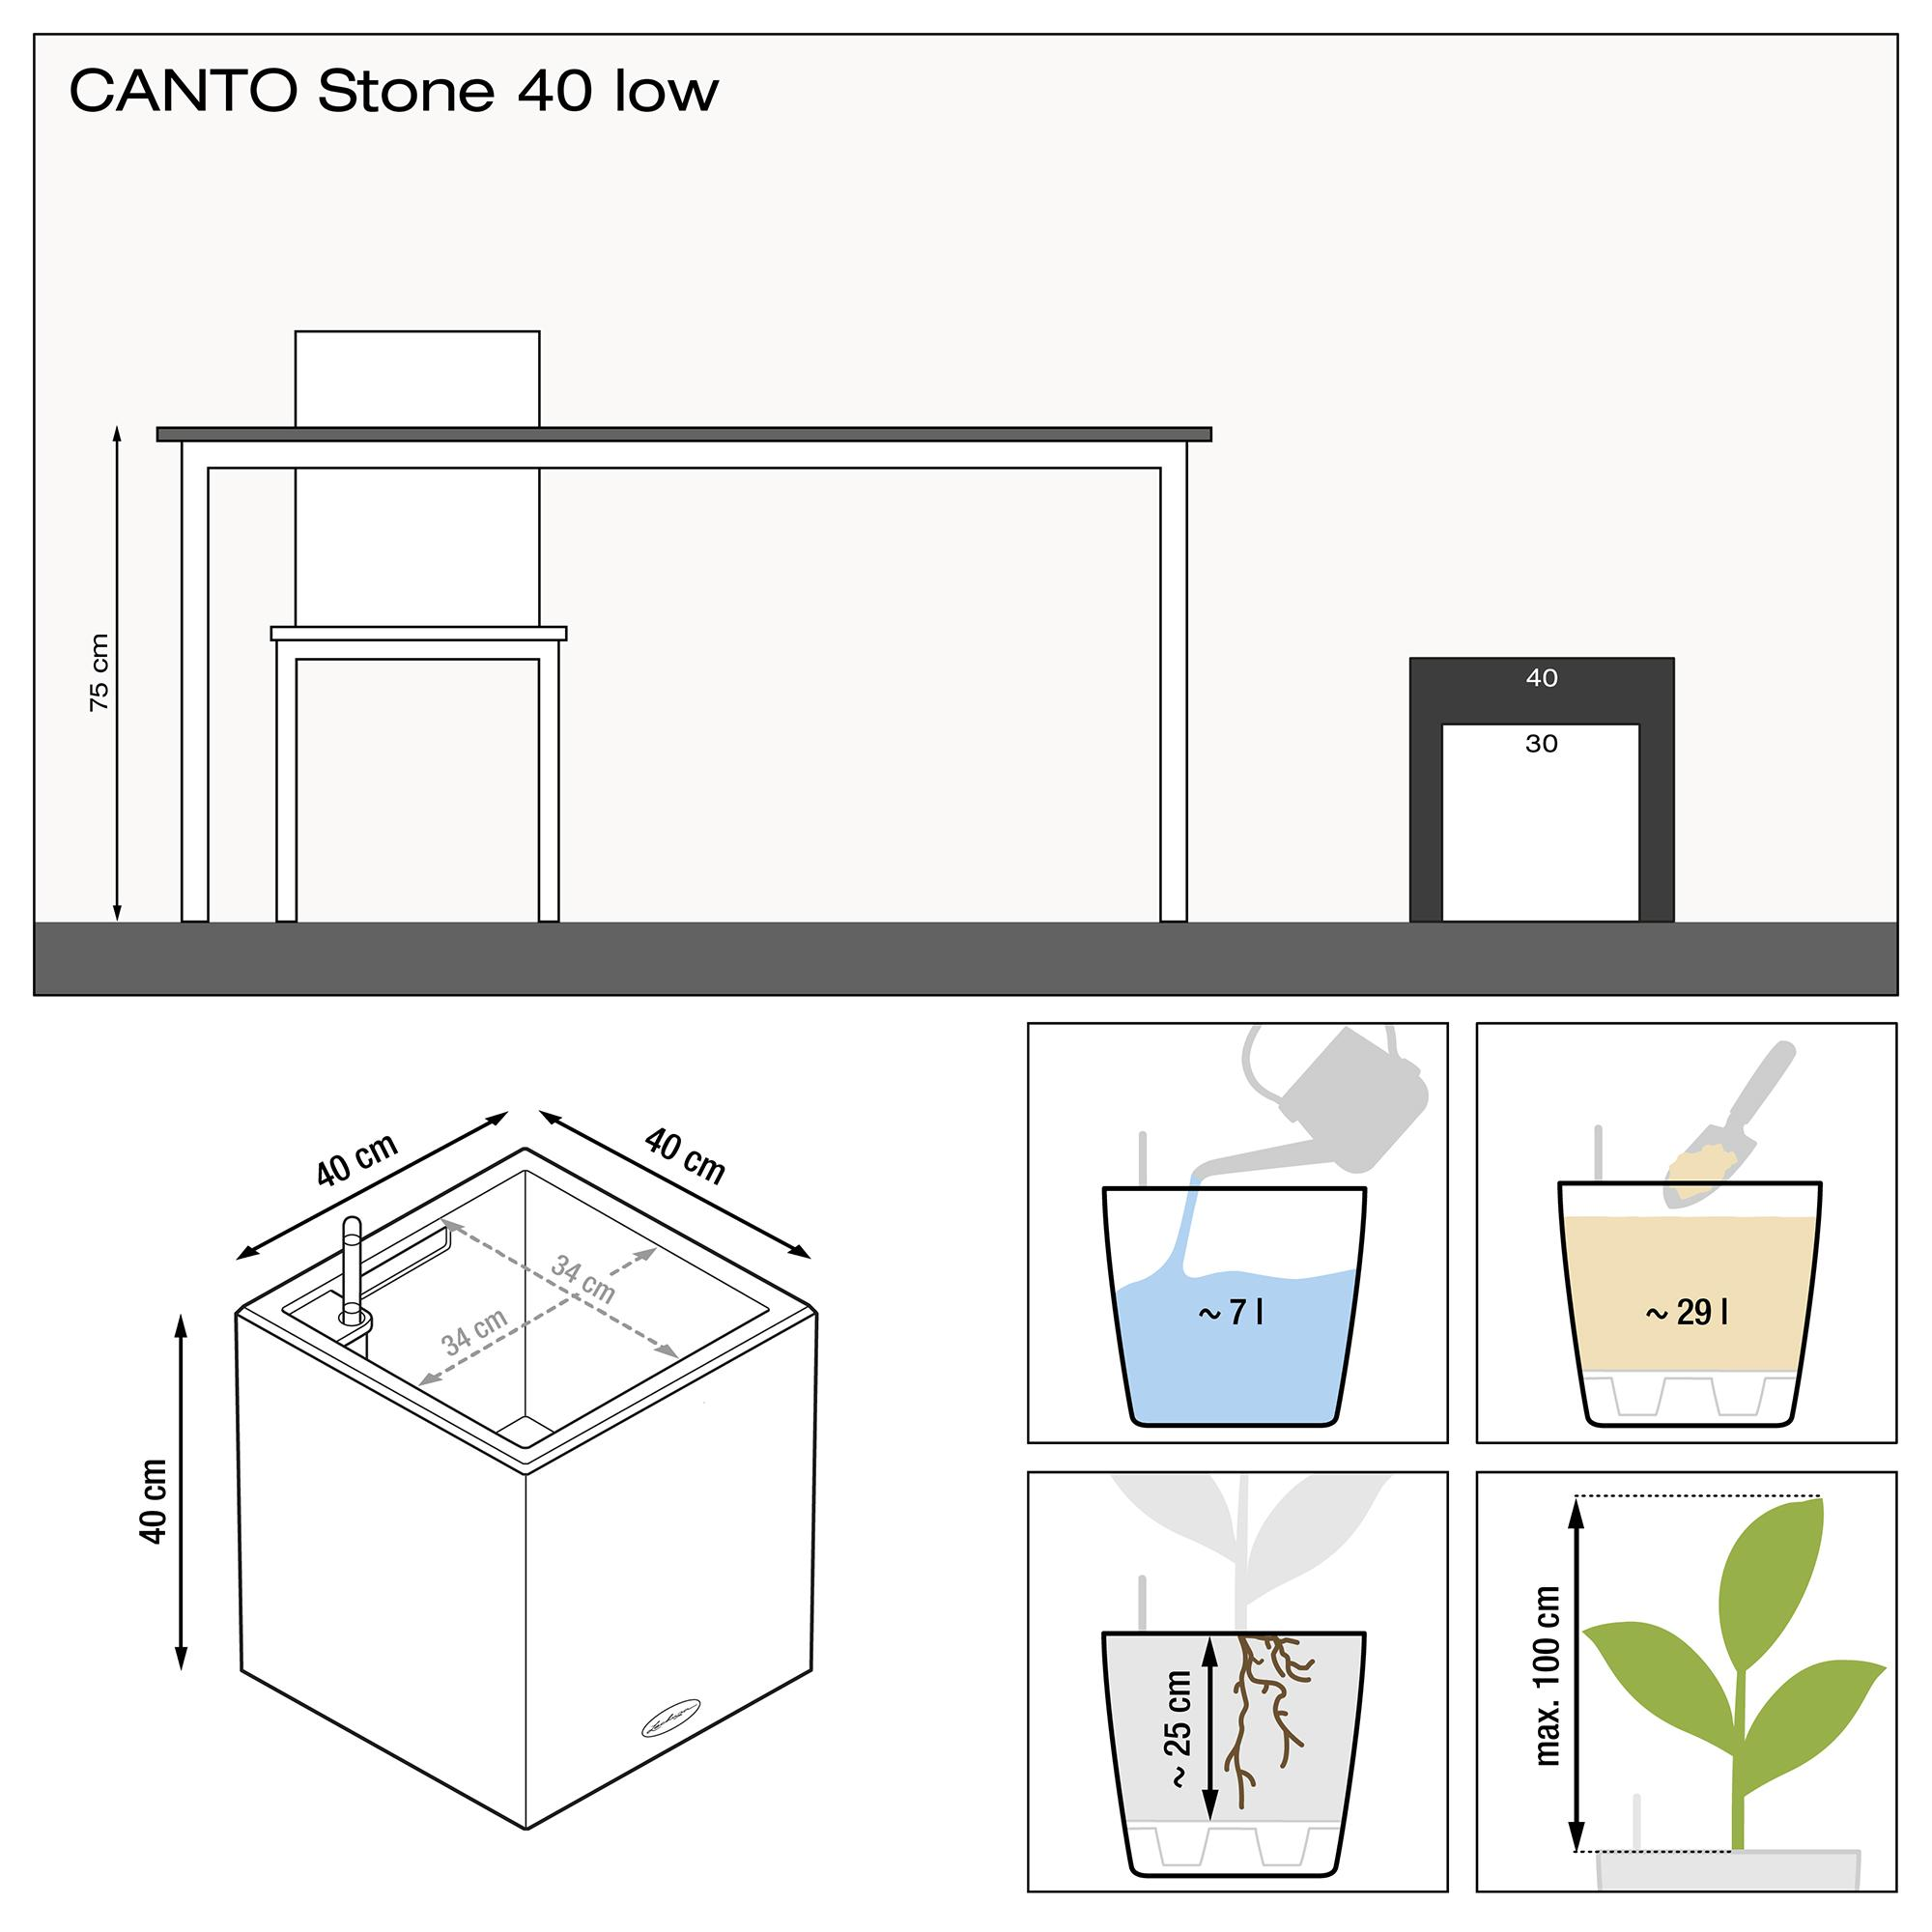 le_canto-stone-wuerfel40_product_addi_nz